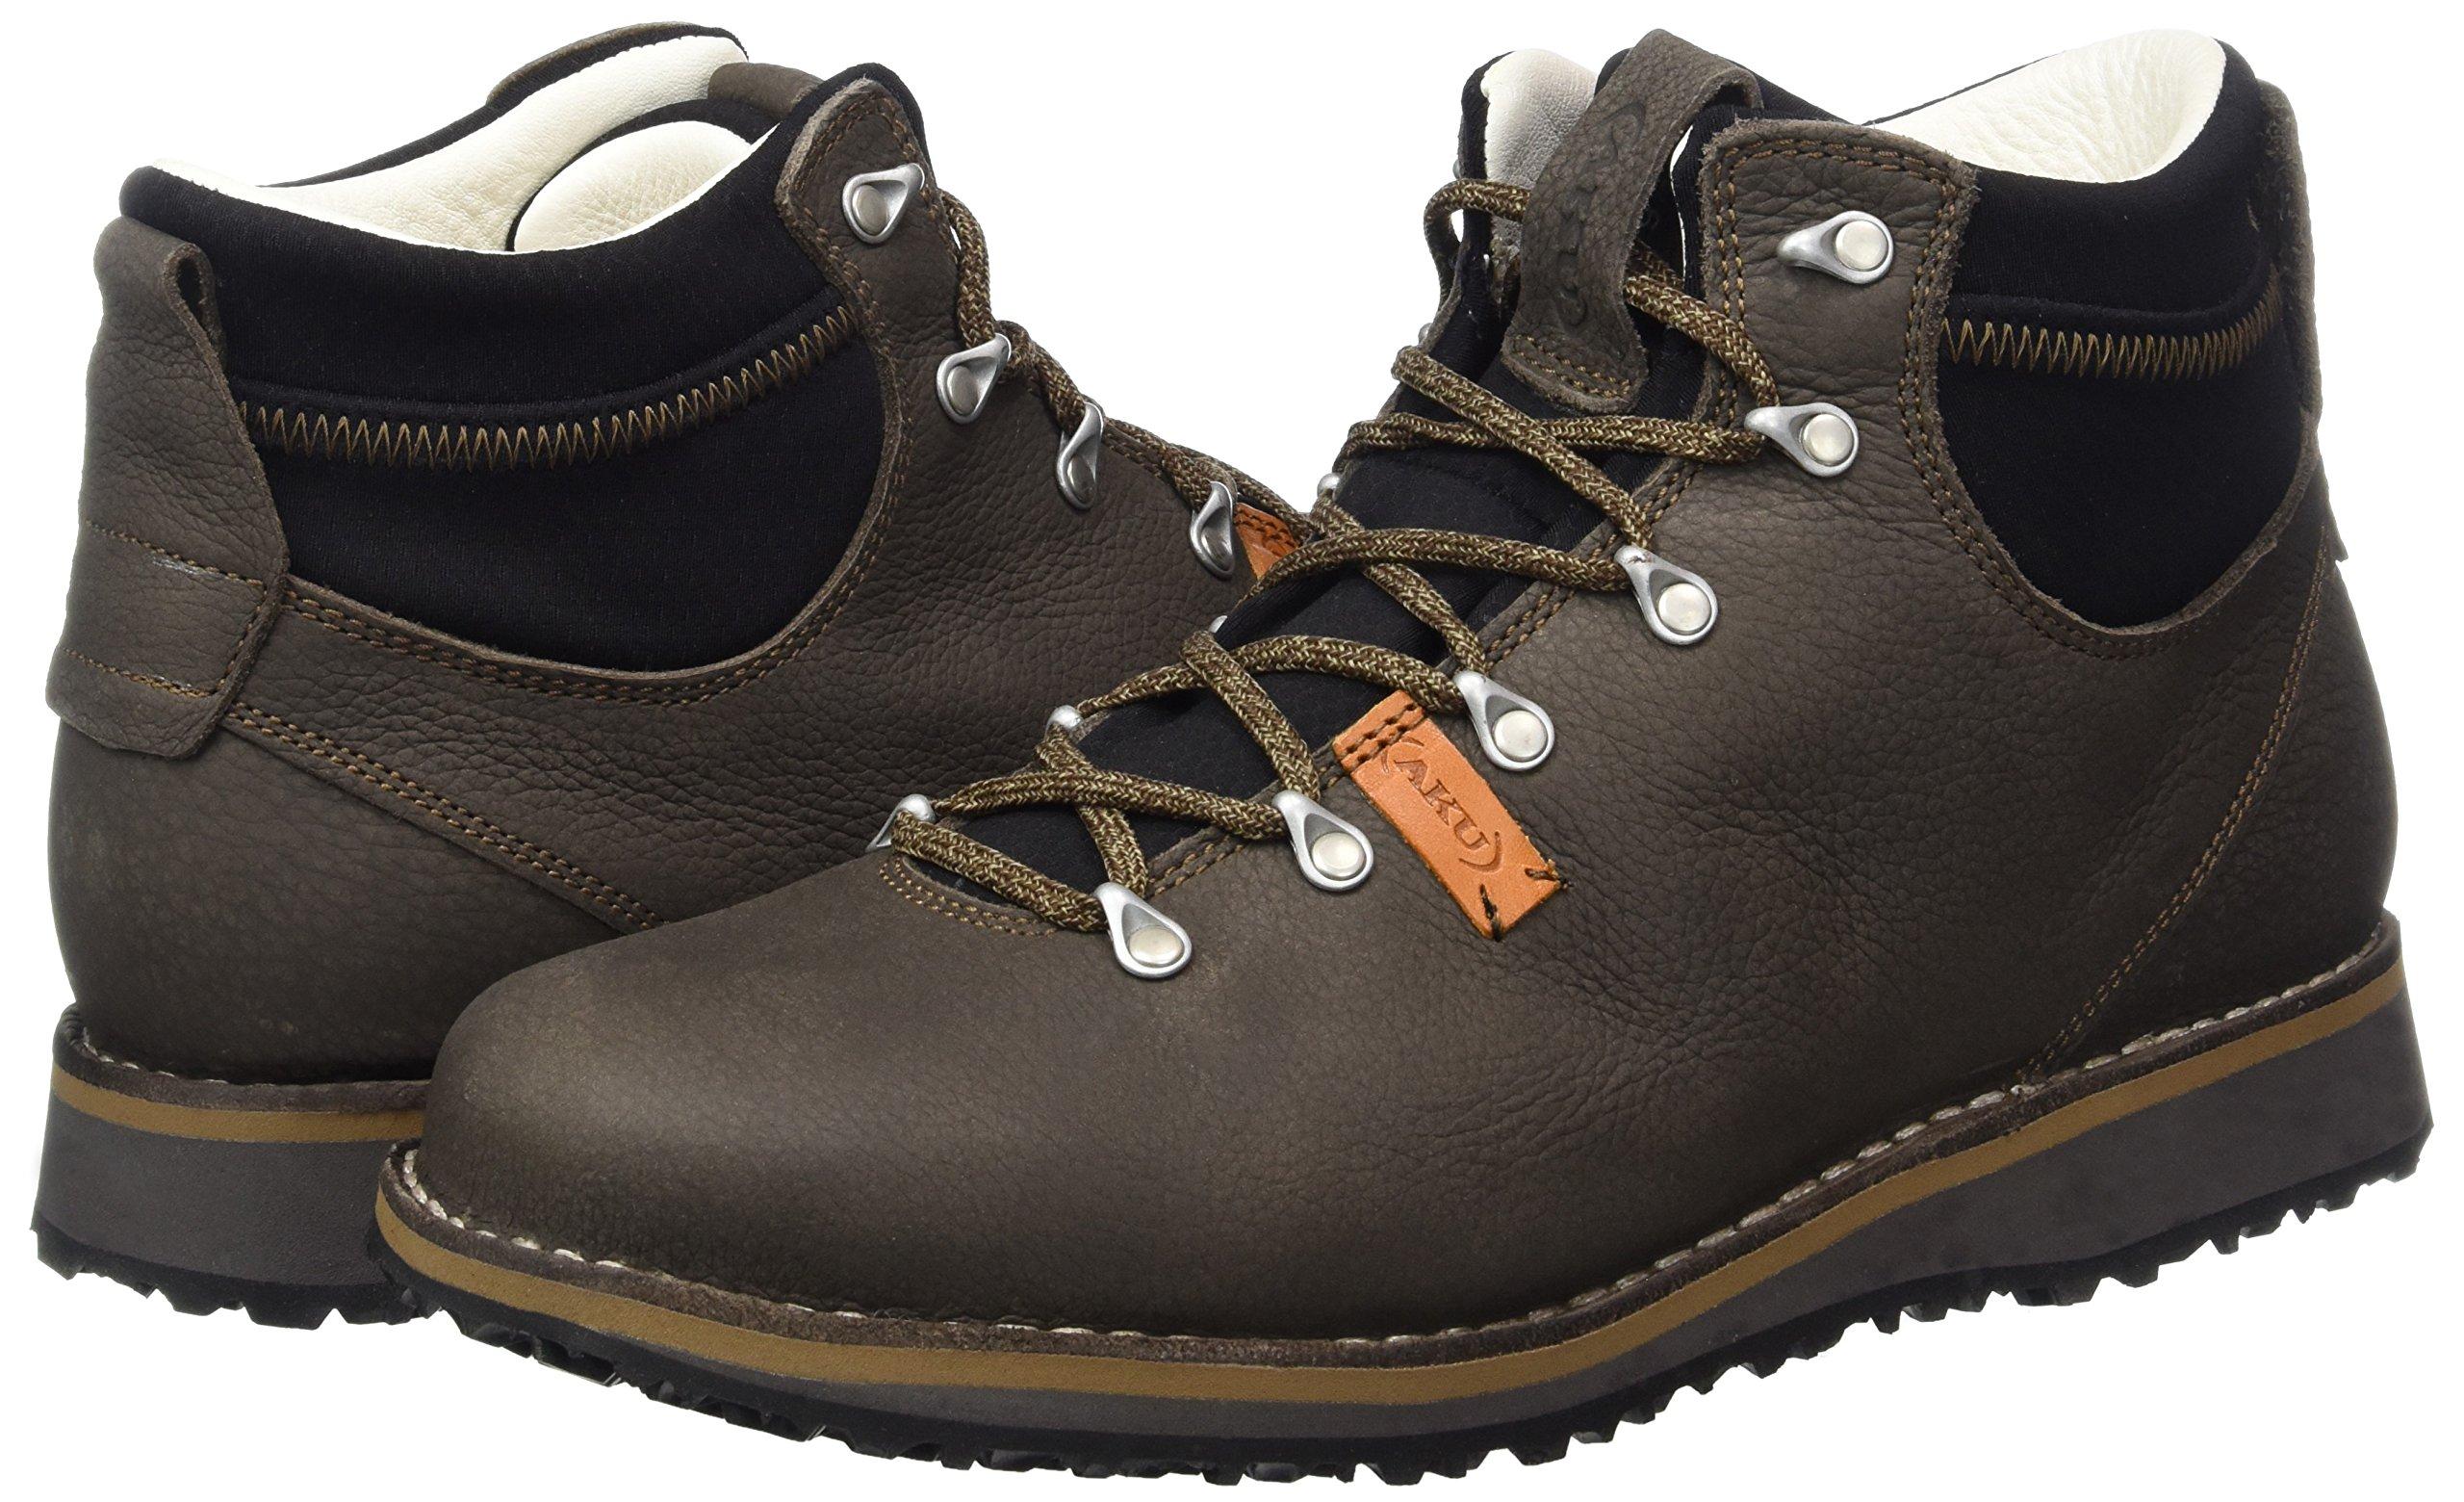 91SrYFVhMjL - AKU Unisex Adults' Badia Plus High Rise Hiking Boots